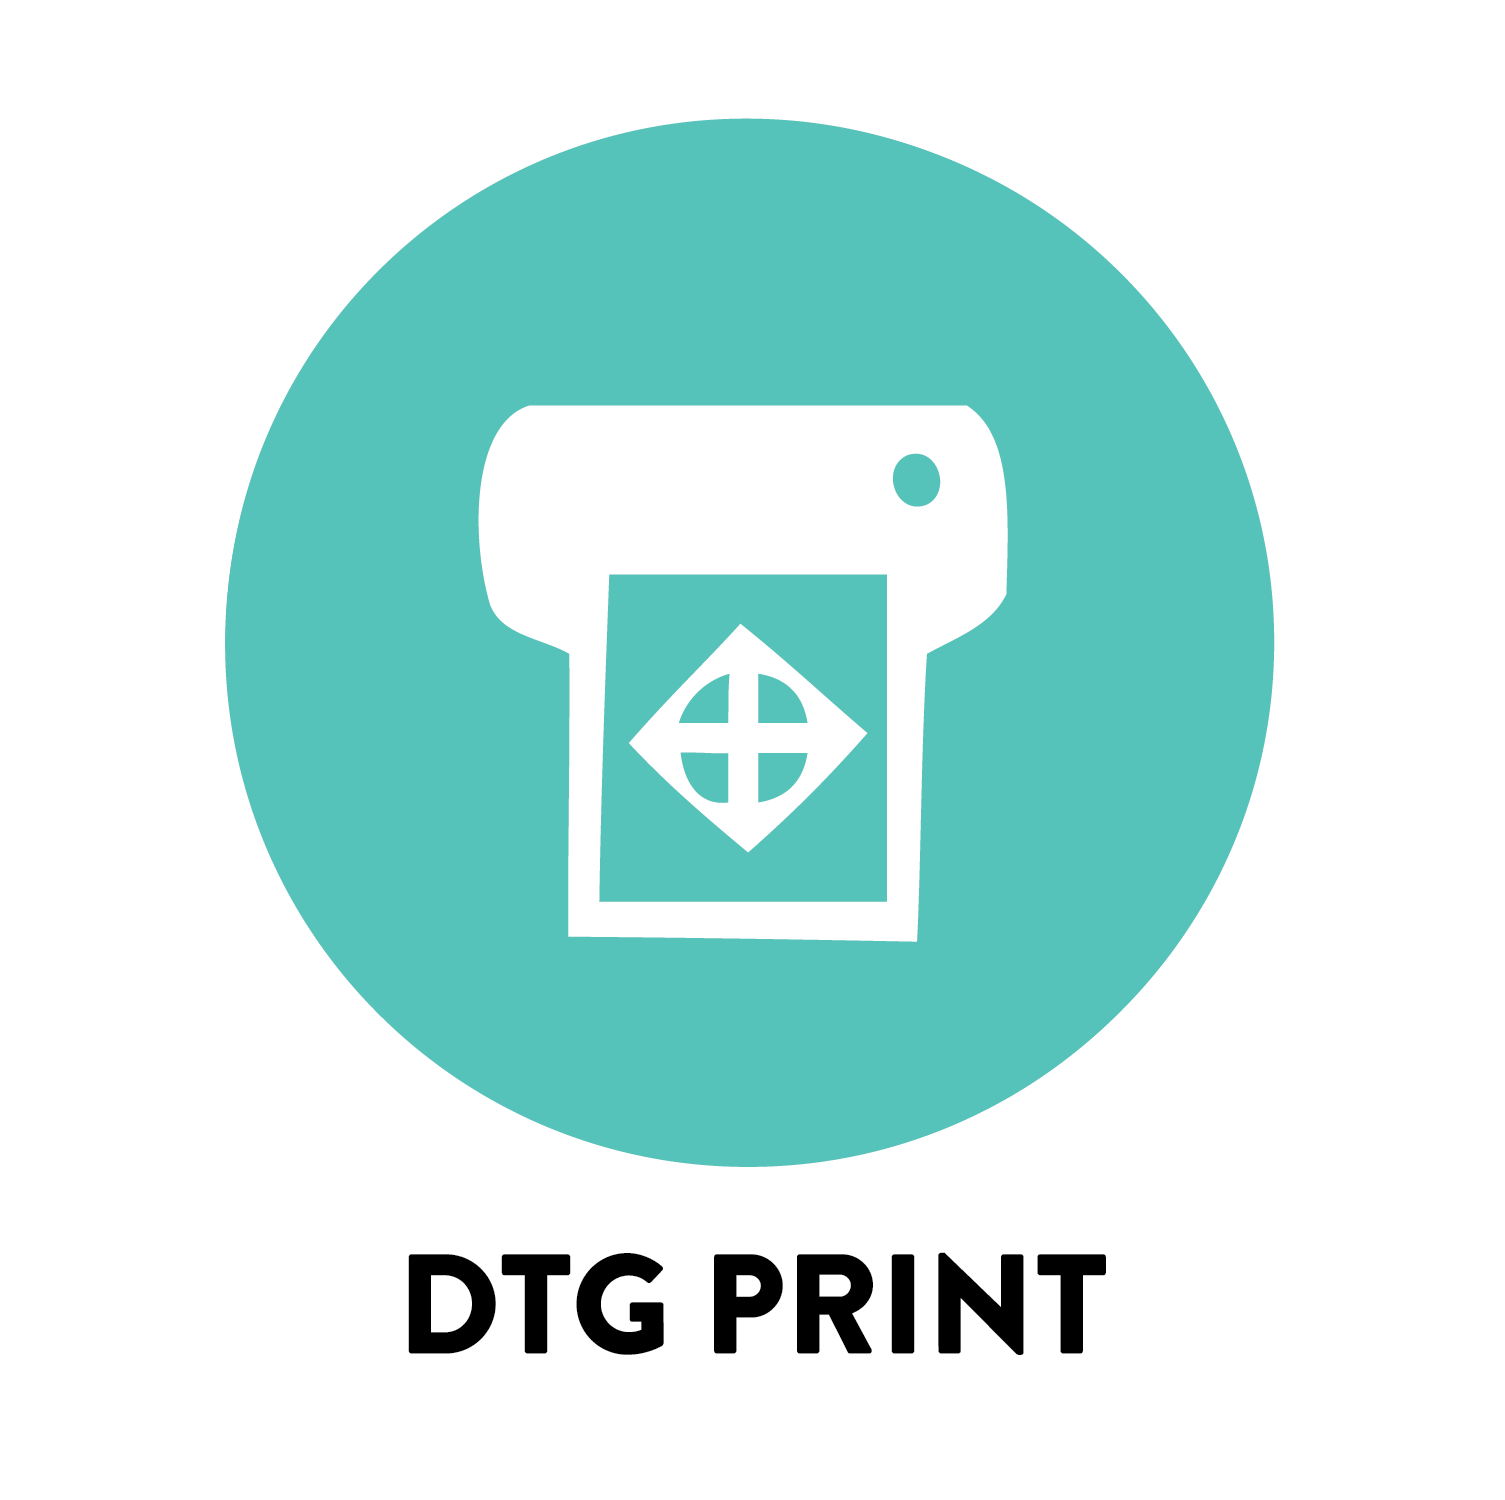 DTG print.png